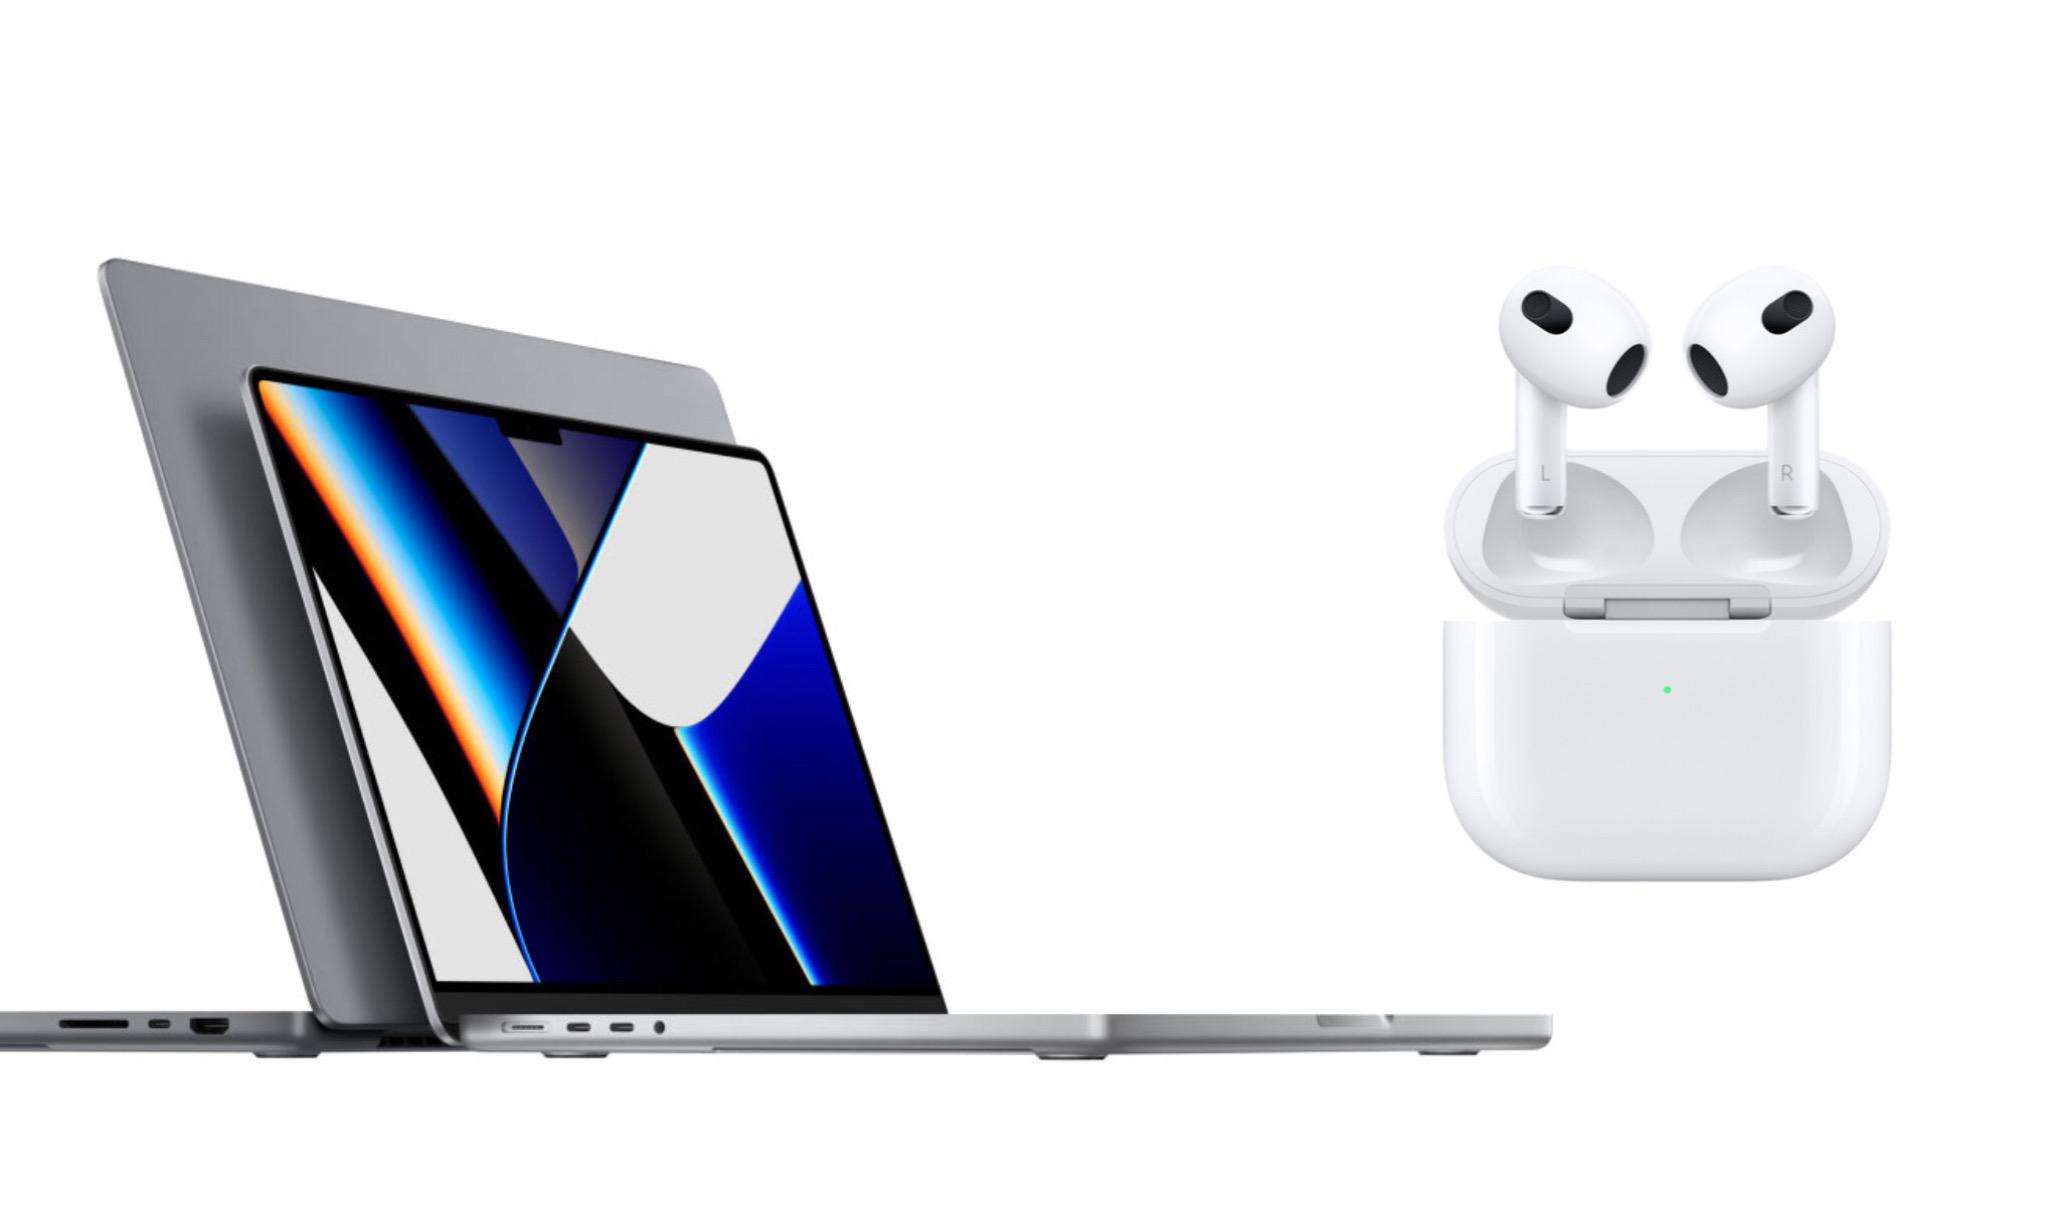 MacBook Pro da 14 e 16 pollici con AirPods 3